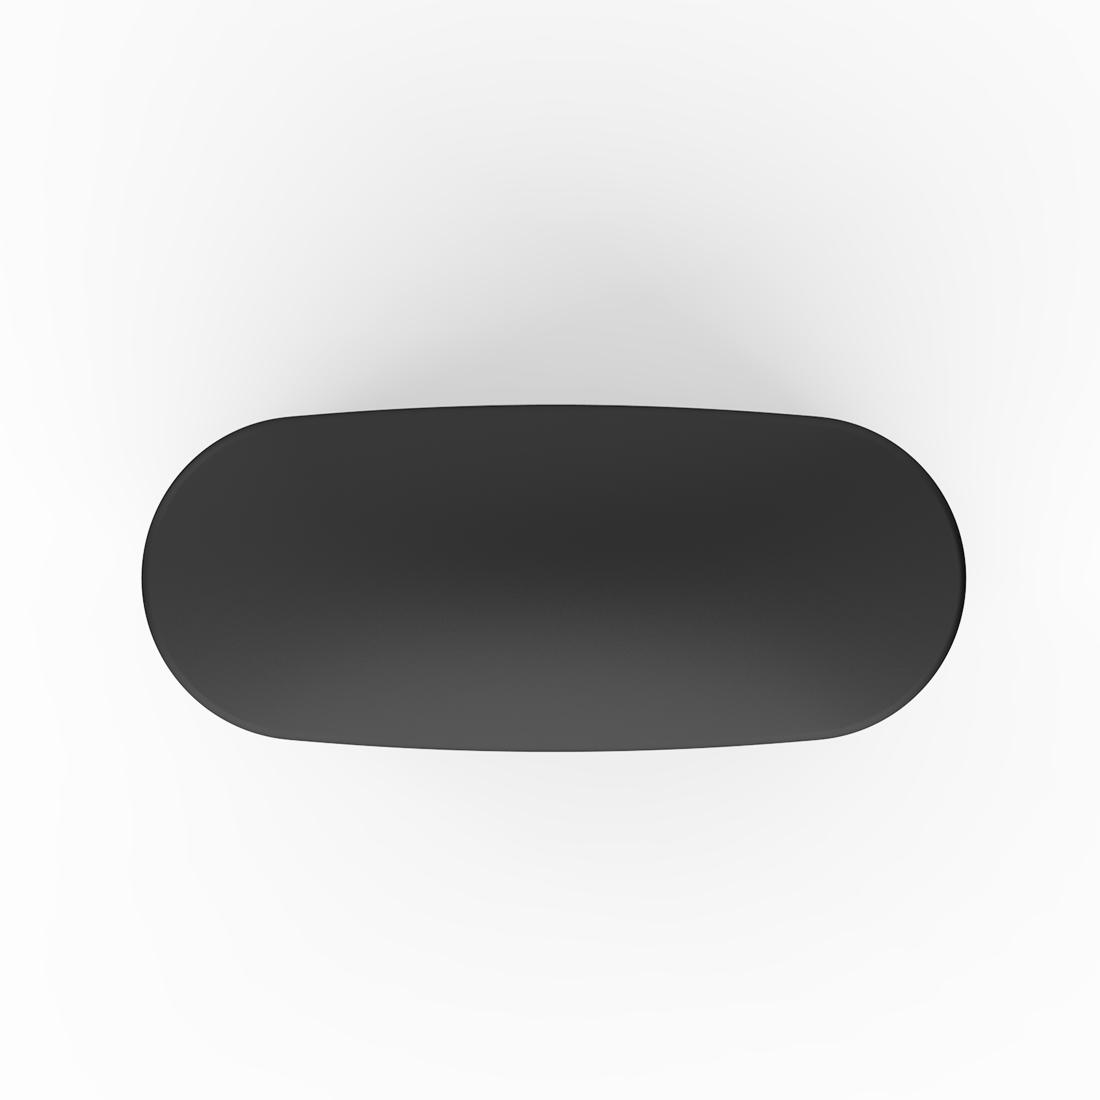 Bluedio T-elf 2 Bluetooth Waterproof True Wireless Stereo Low Latency Earbuds Headphones